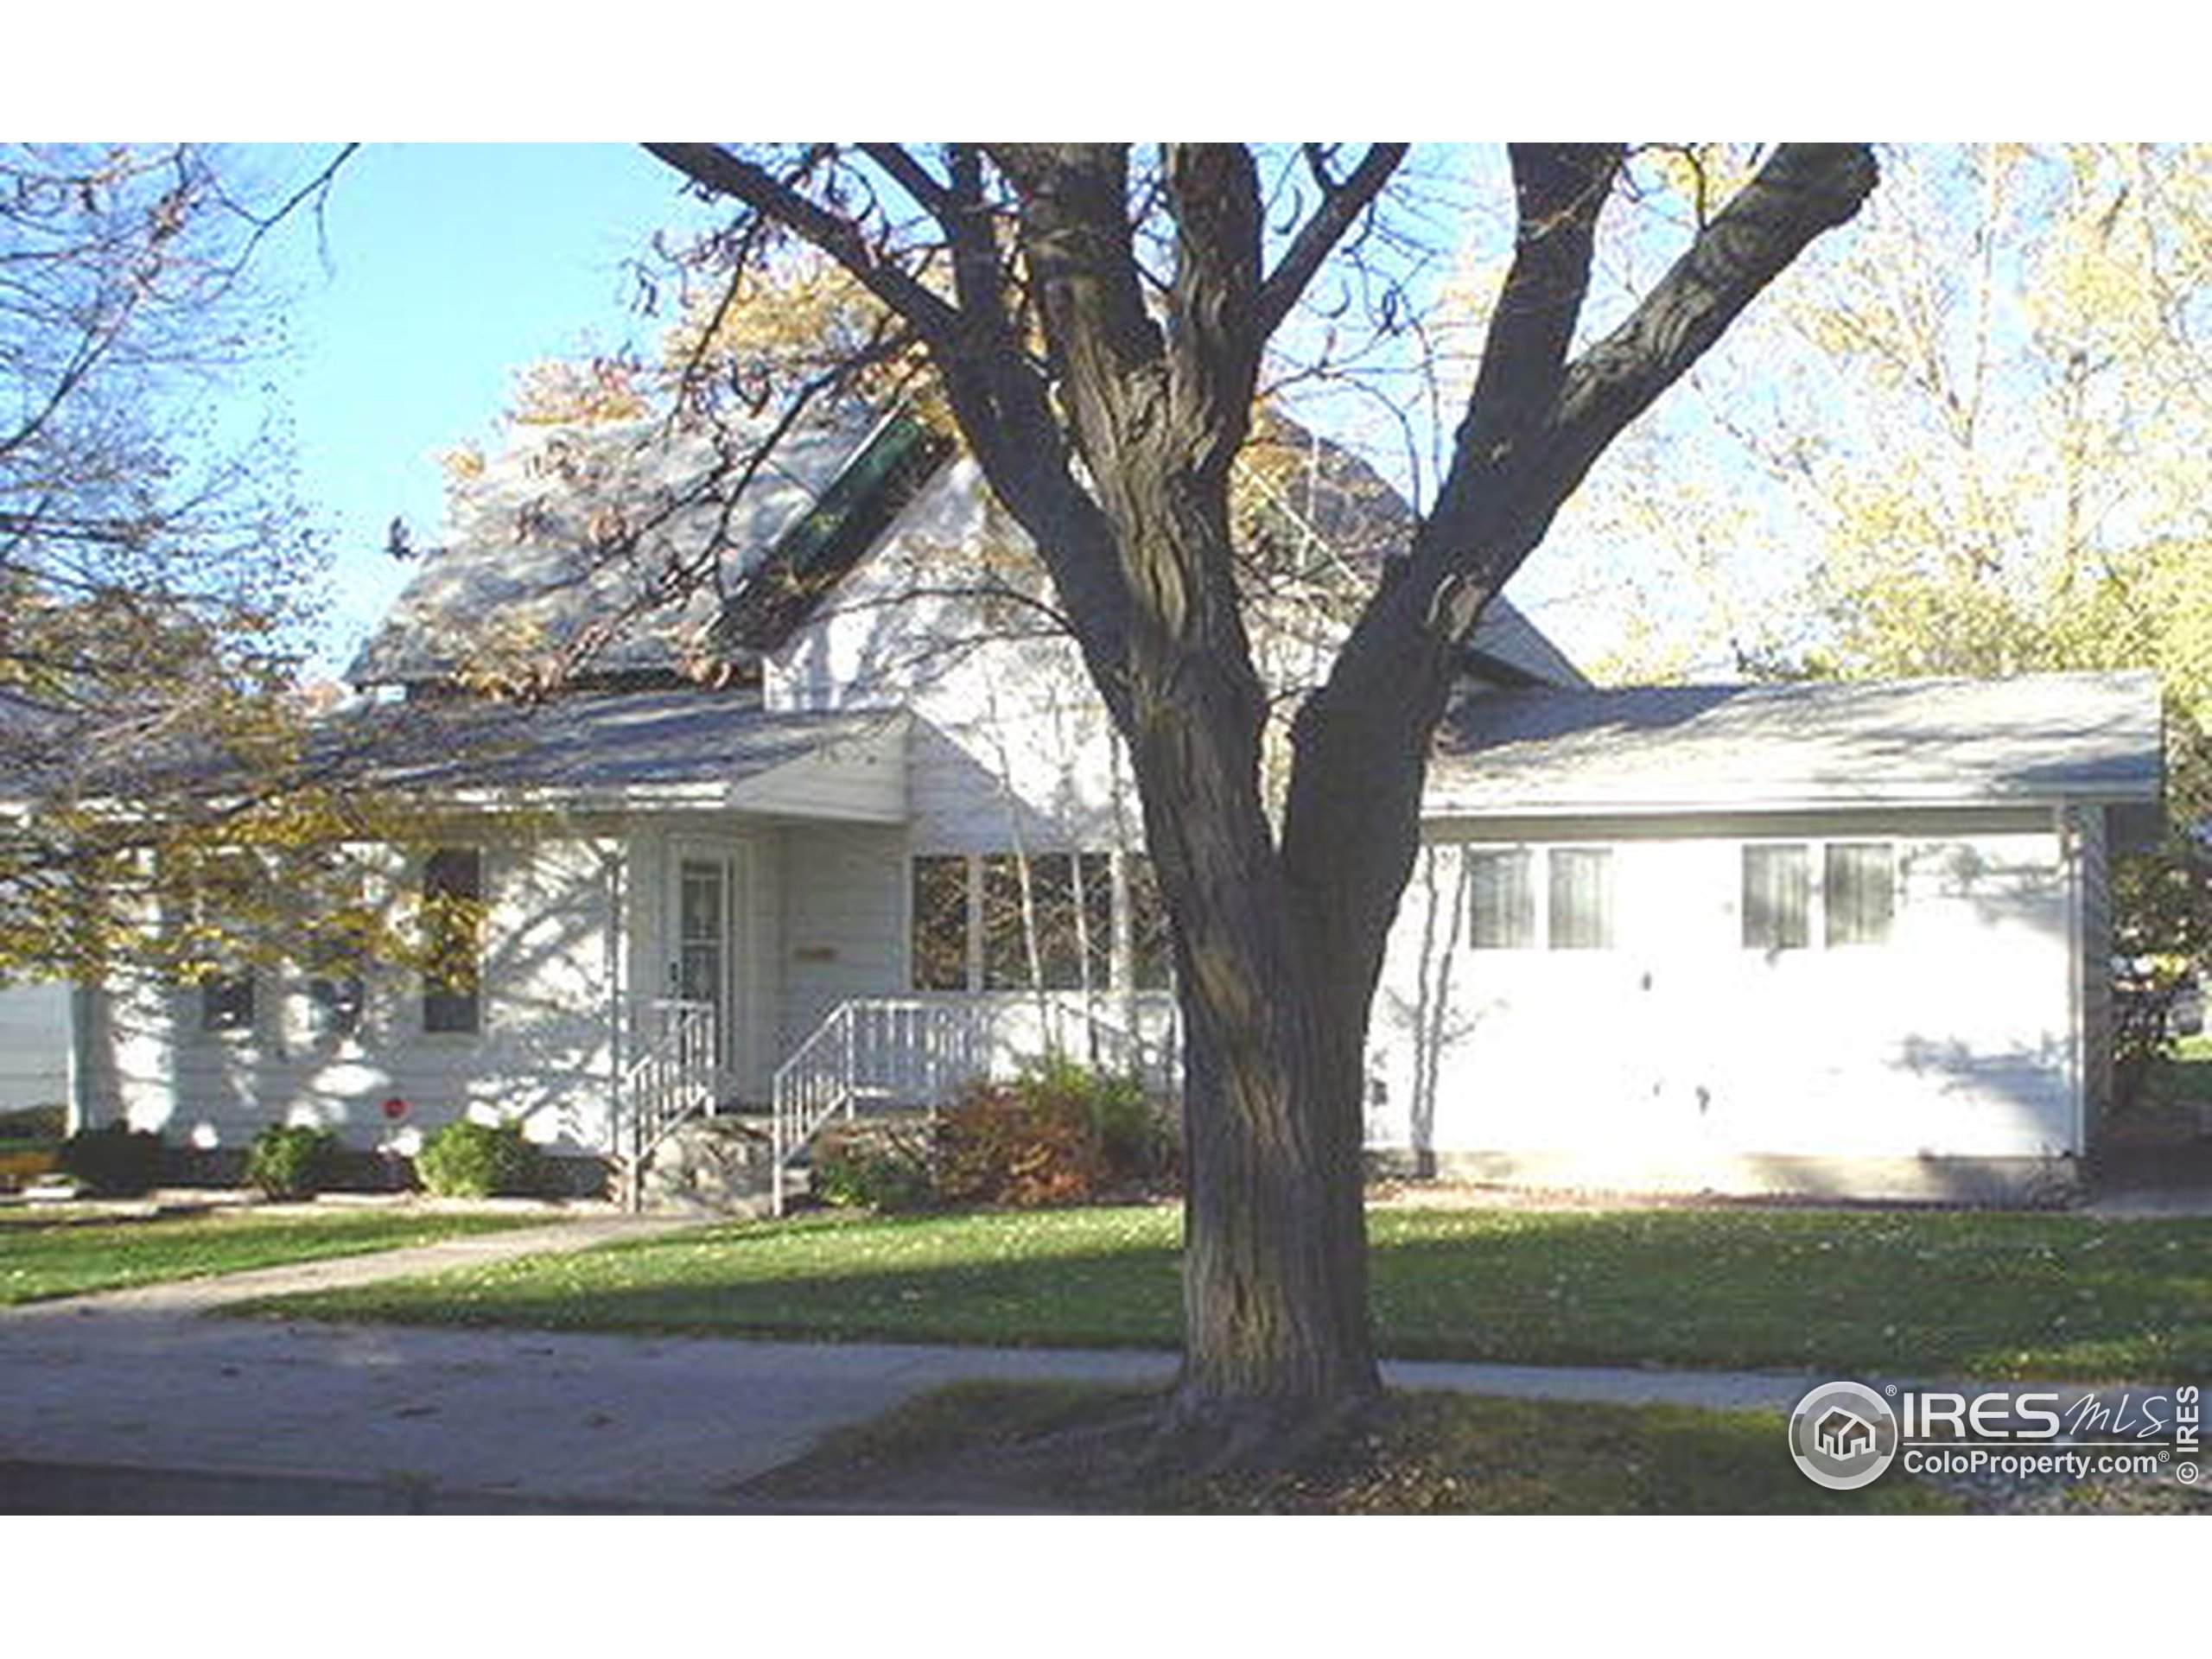 245 Honeysuckle Way, Johnstown, CO 80534 (#942822) :: iHomes Colorado